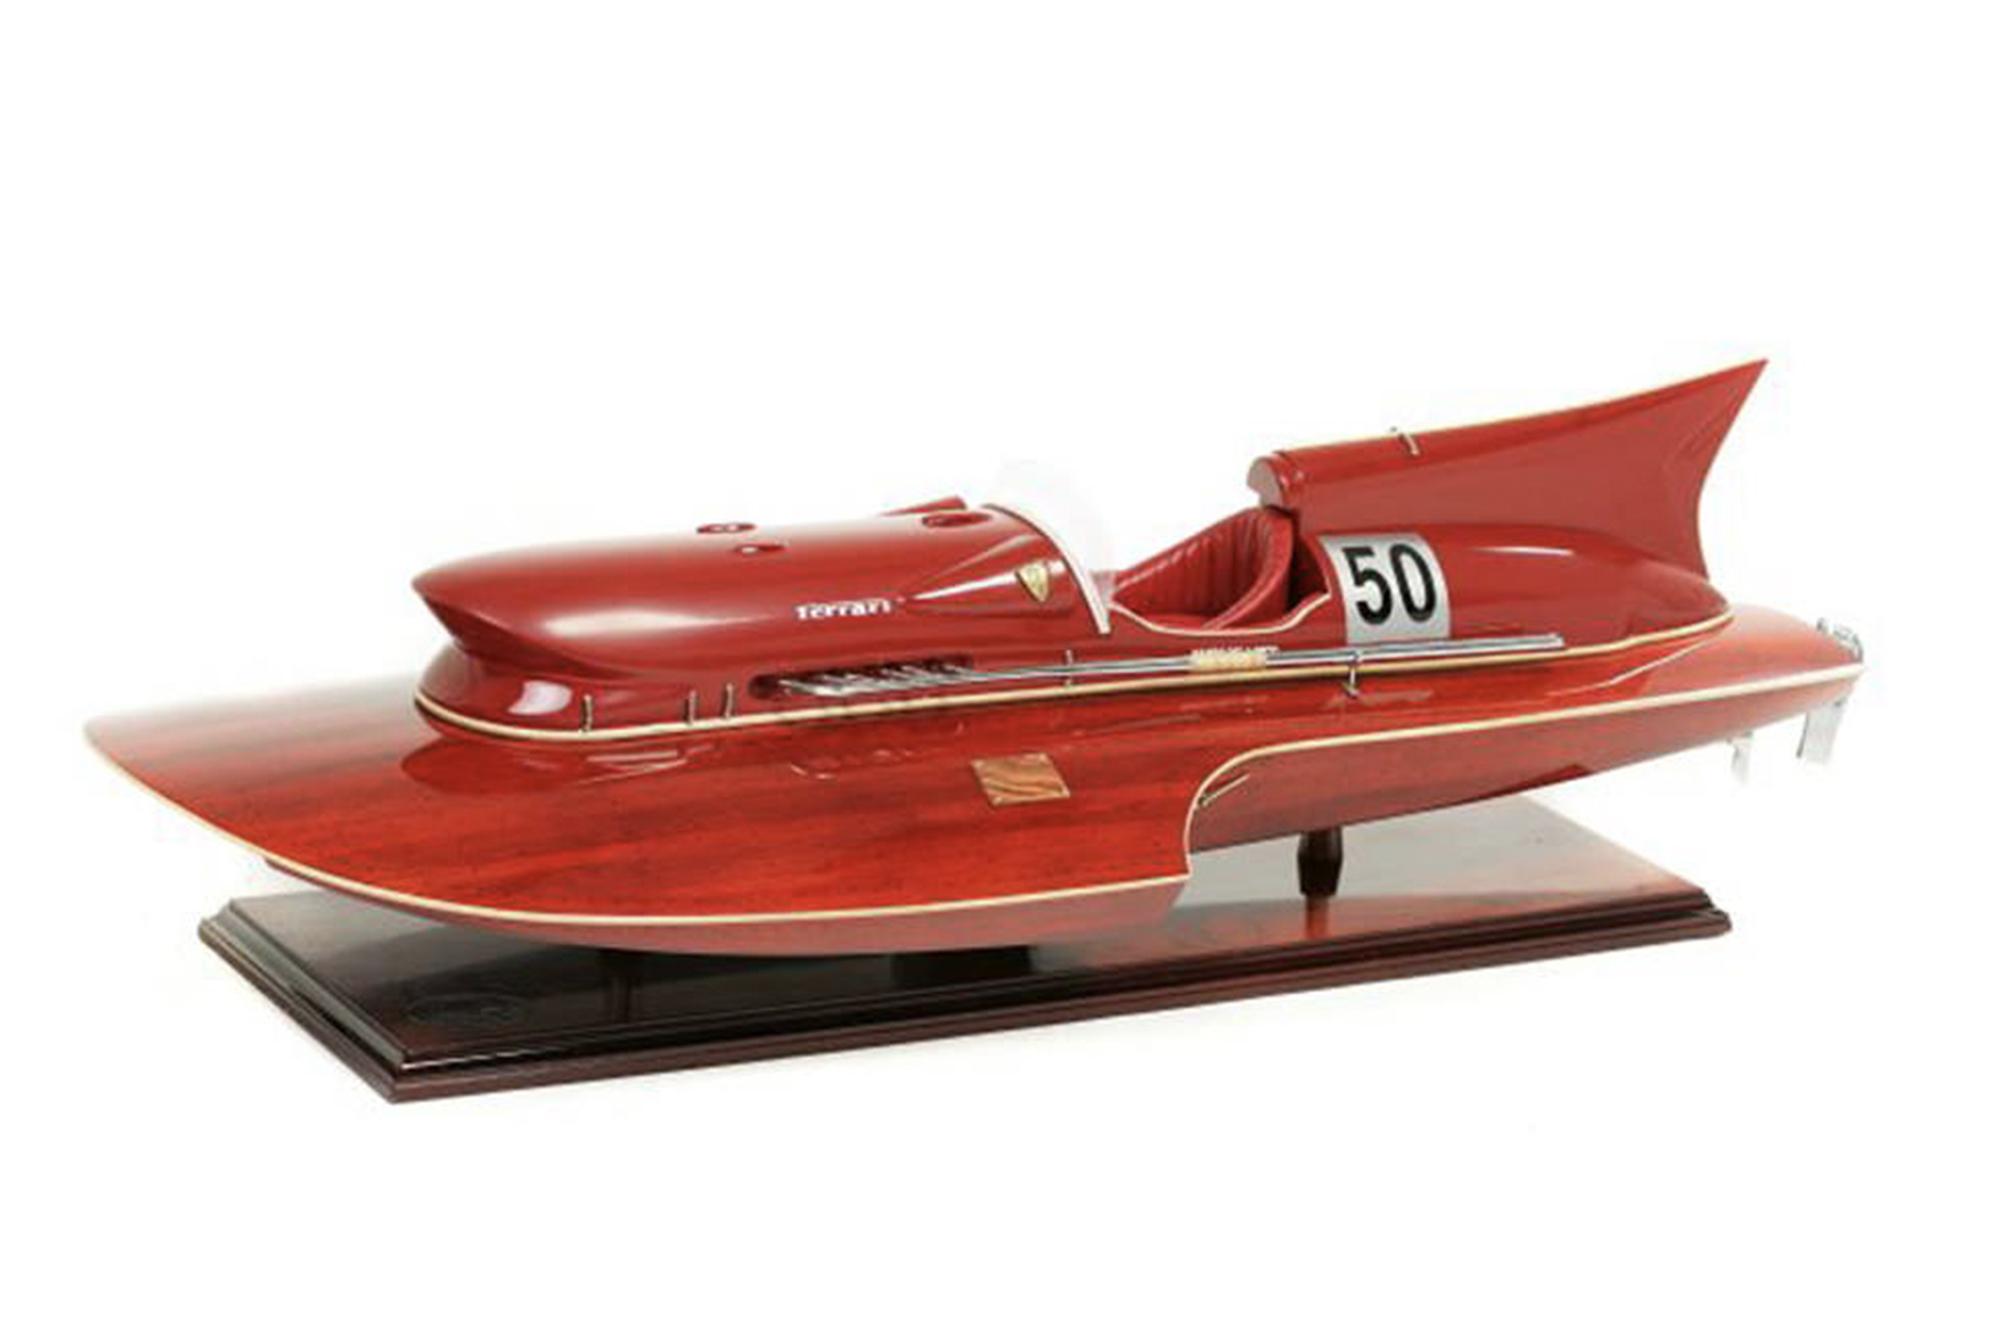 Ferrari hydroplane model